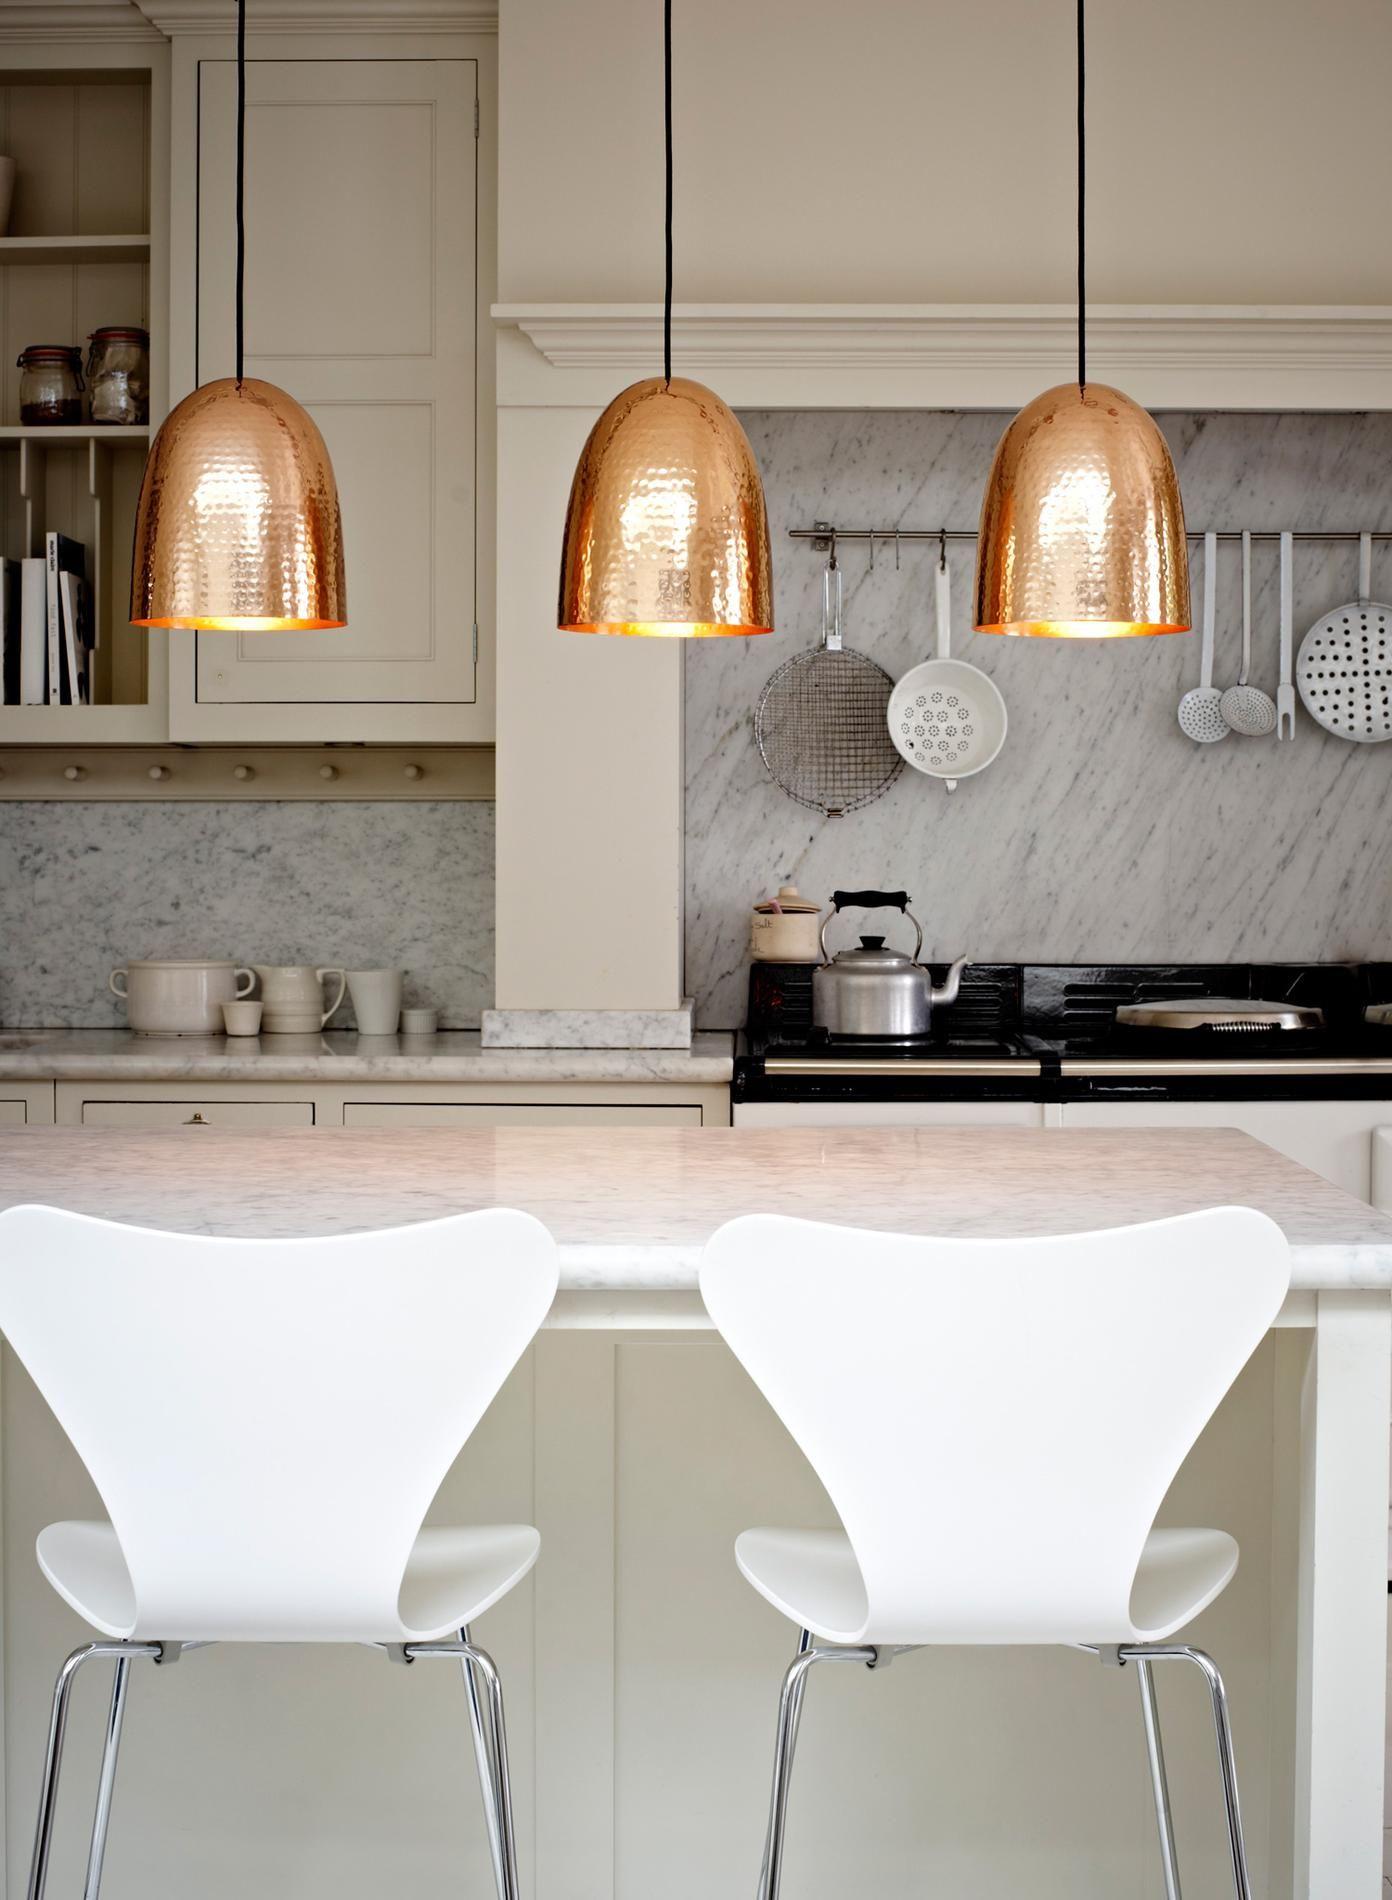 eclairage cuisine inspiration conseil deco